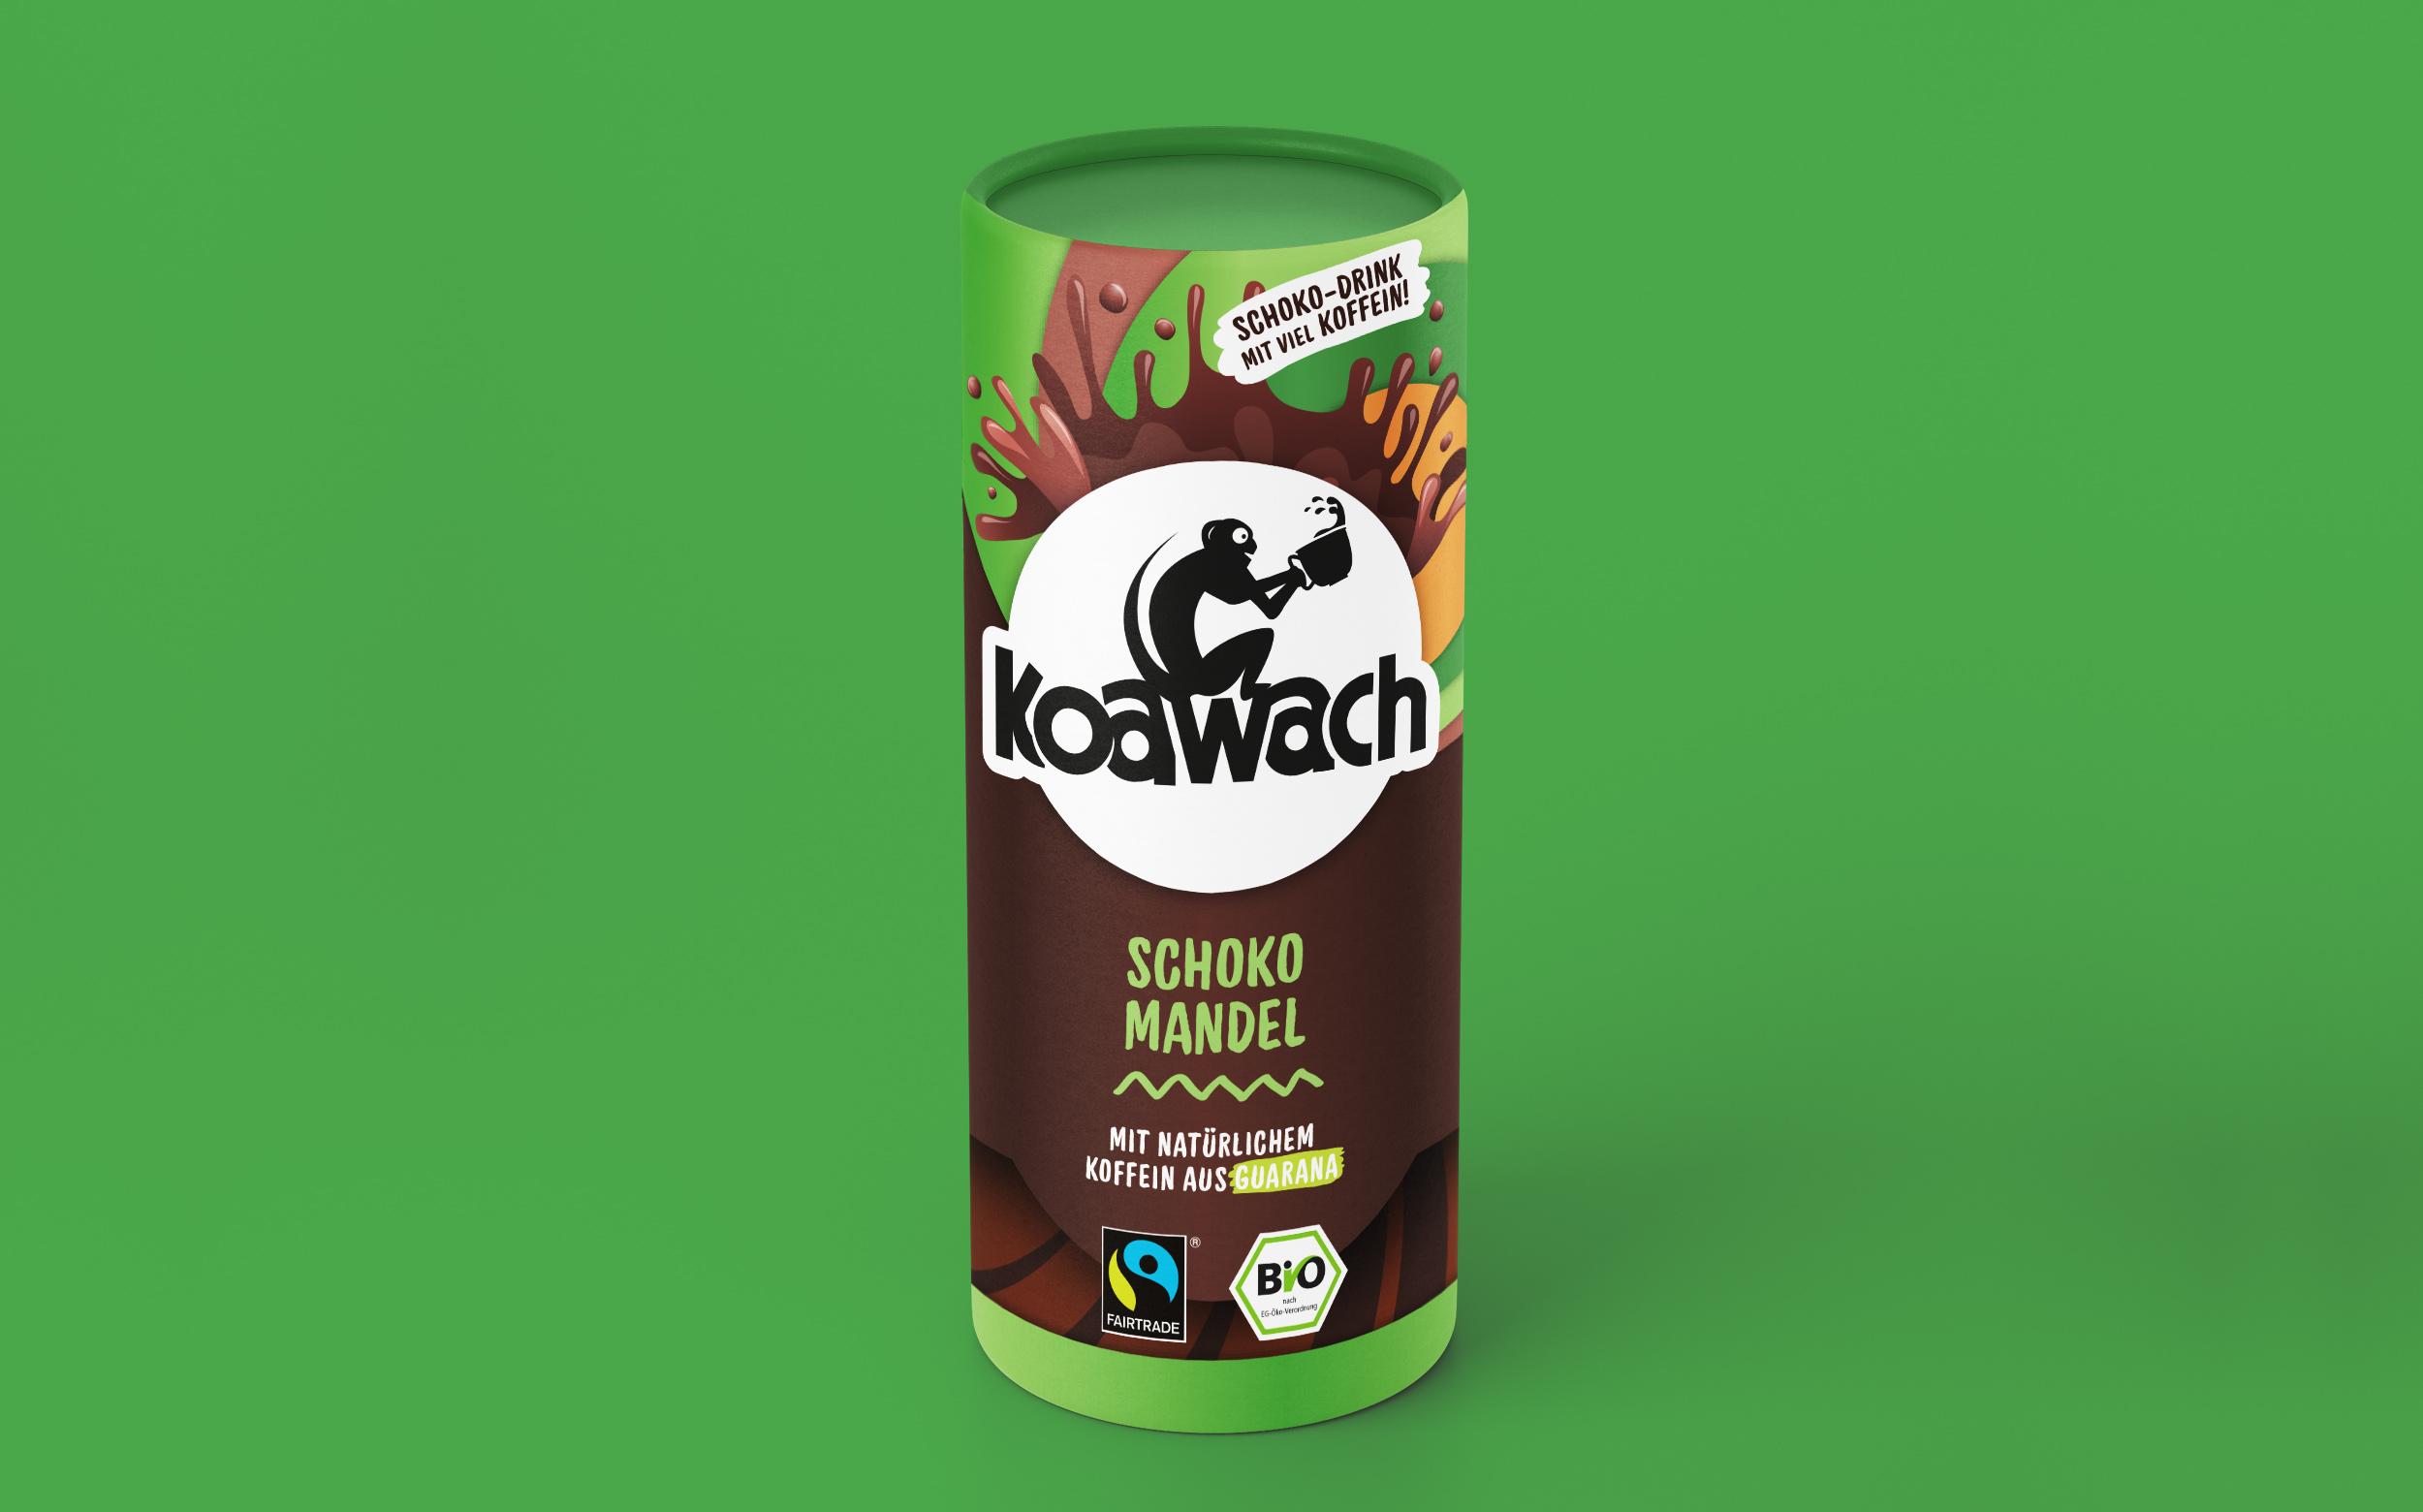 Koawach_02-1